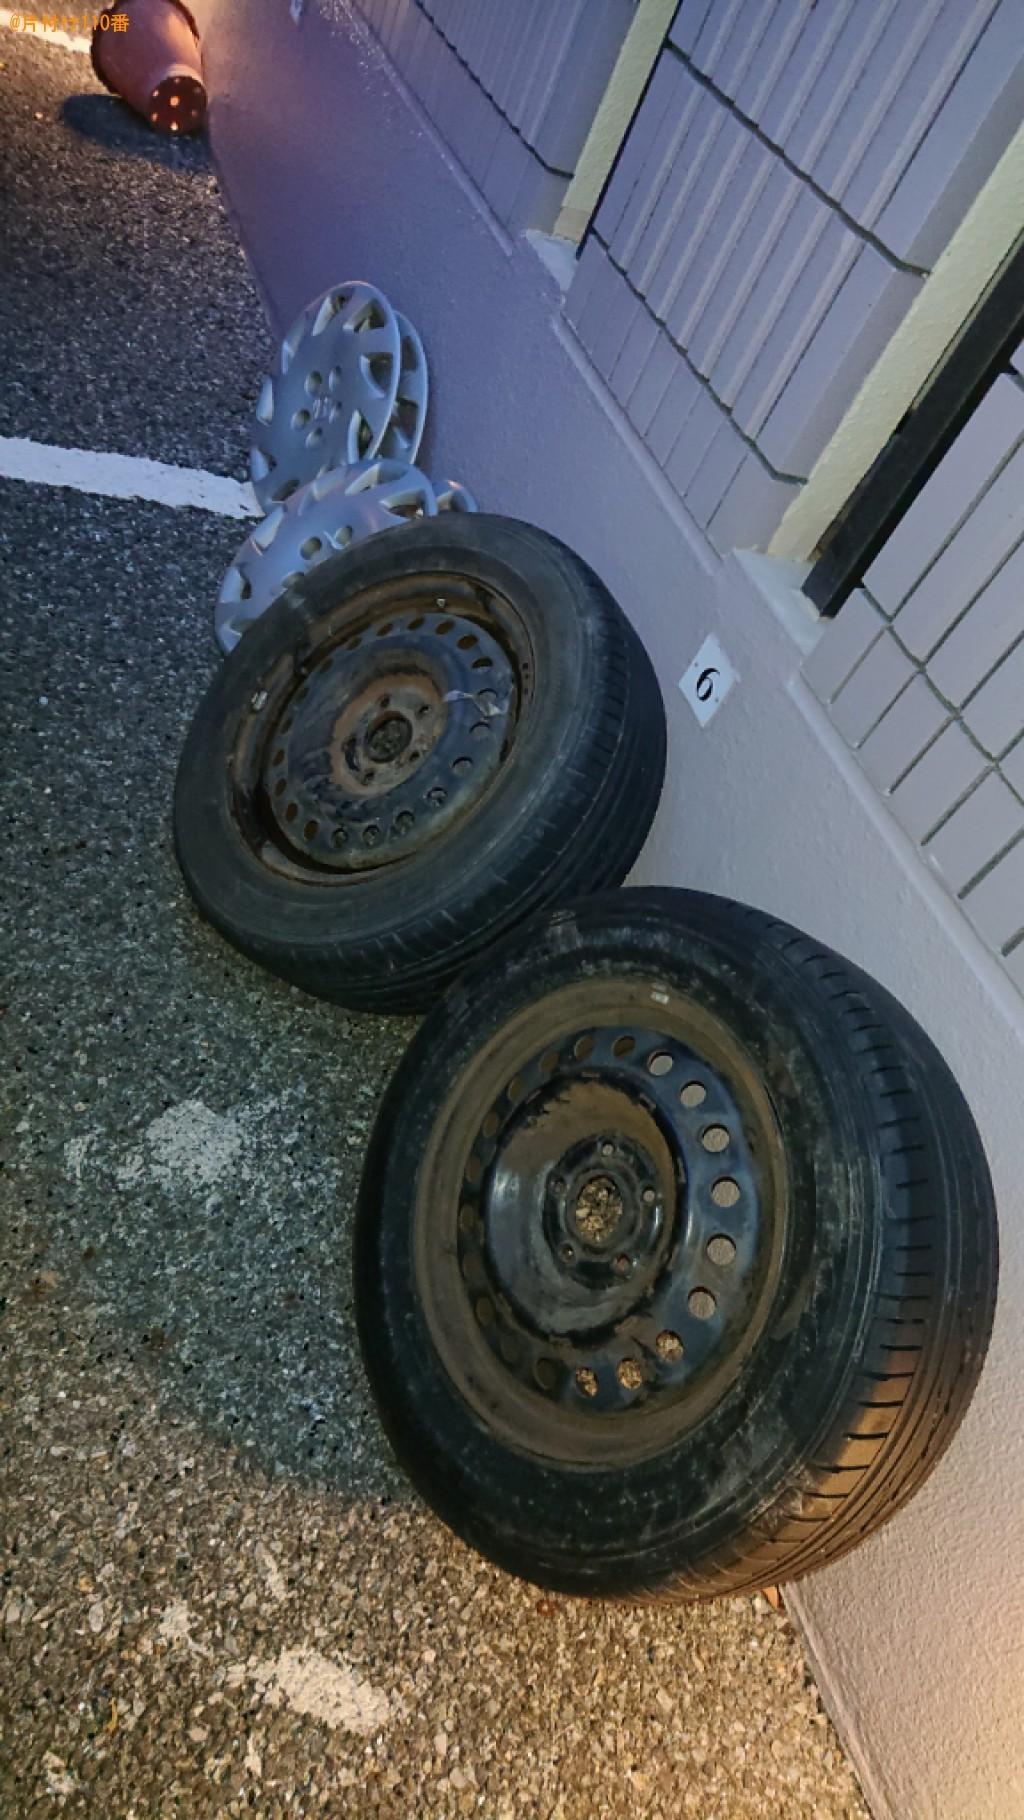 【尼崎市武庫町】自動車タイヤの回収・処分ご依頼 お客様の声